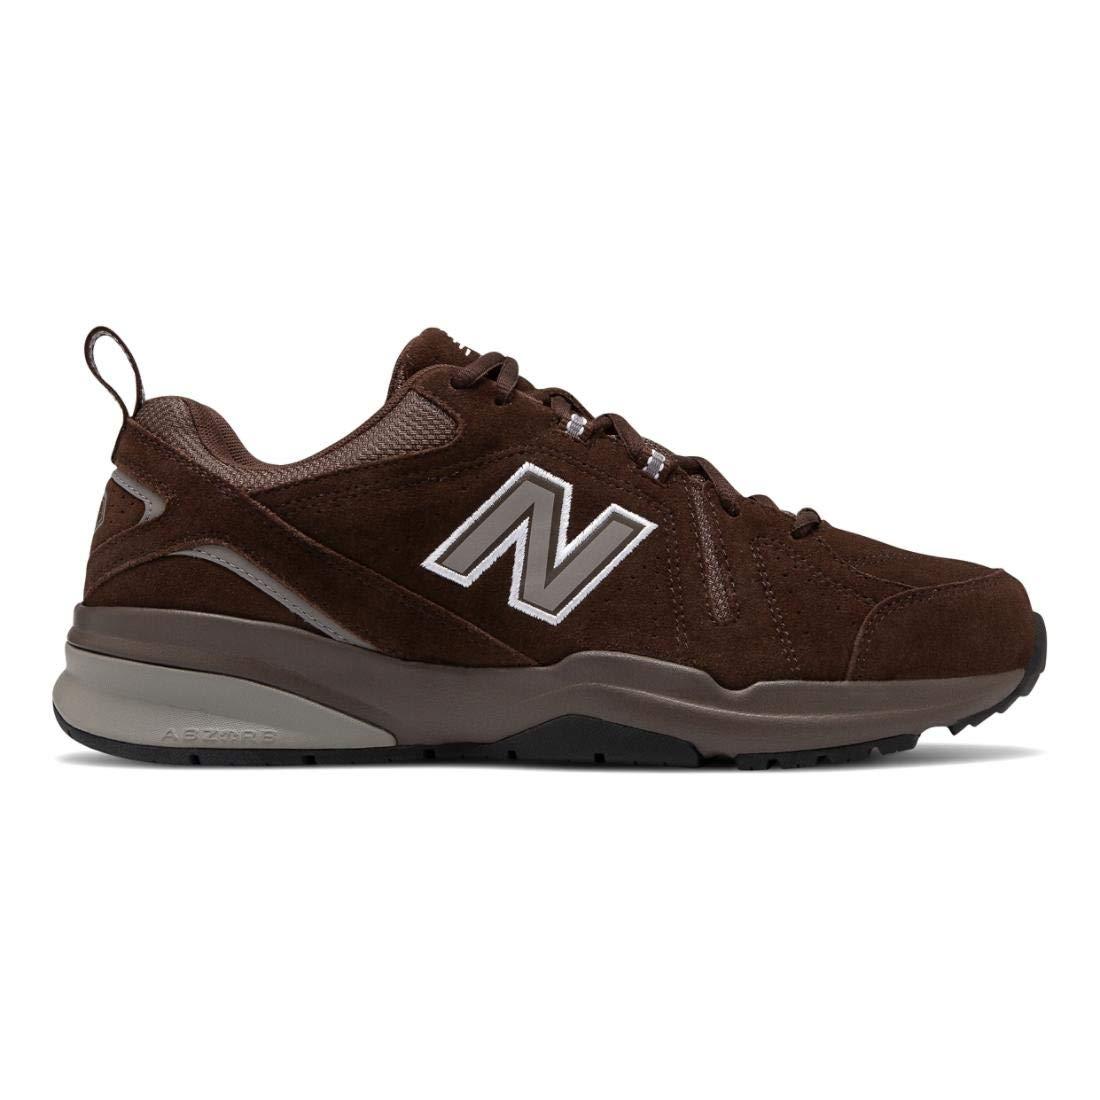 New Balance Men's 608v5 Casual Comfort Walking Shoe, Chocolate Brown/White, 11 2E US